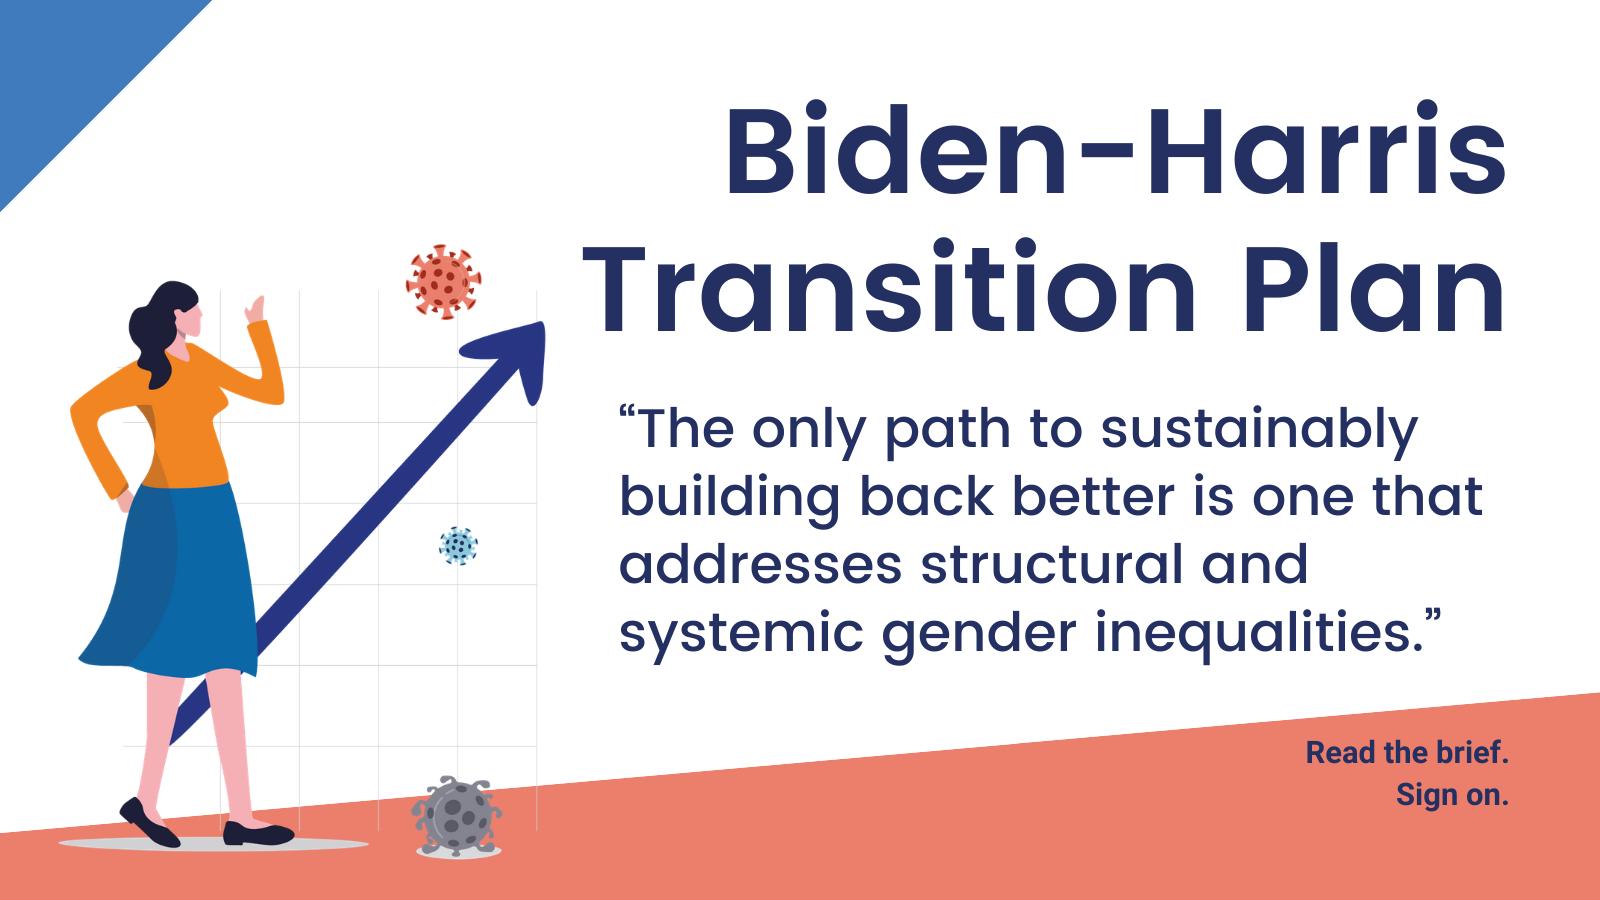 Biden-Harris Transition Plan